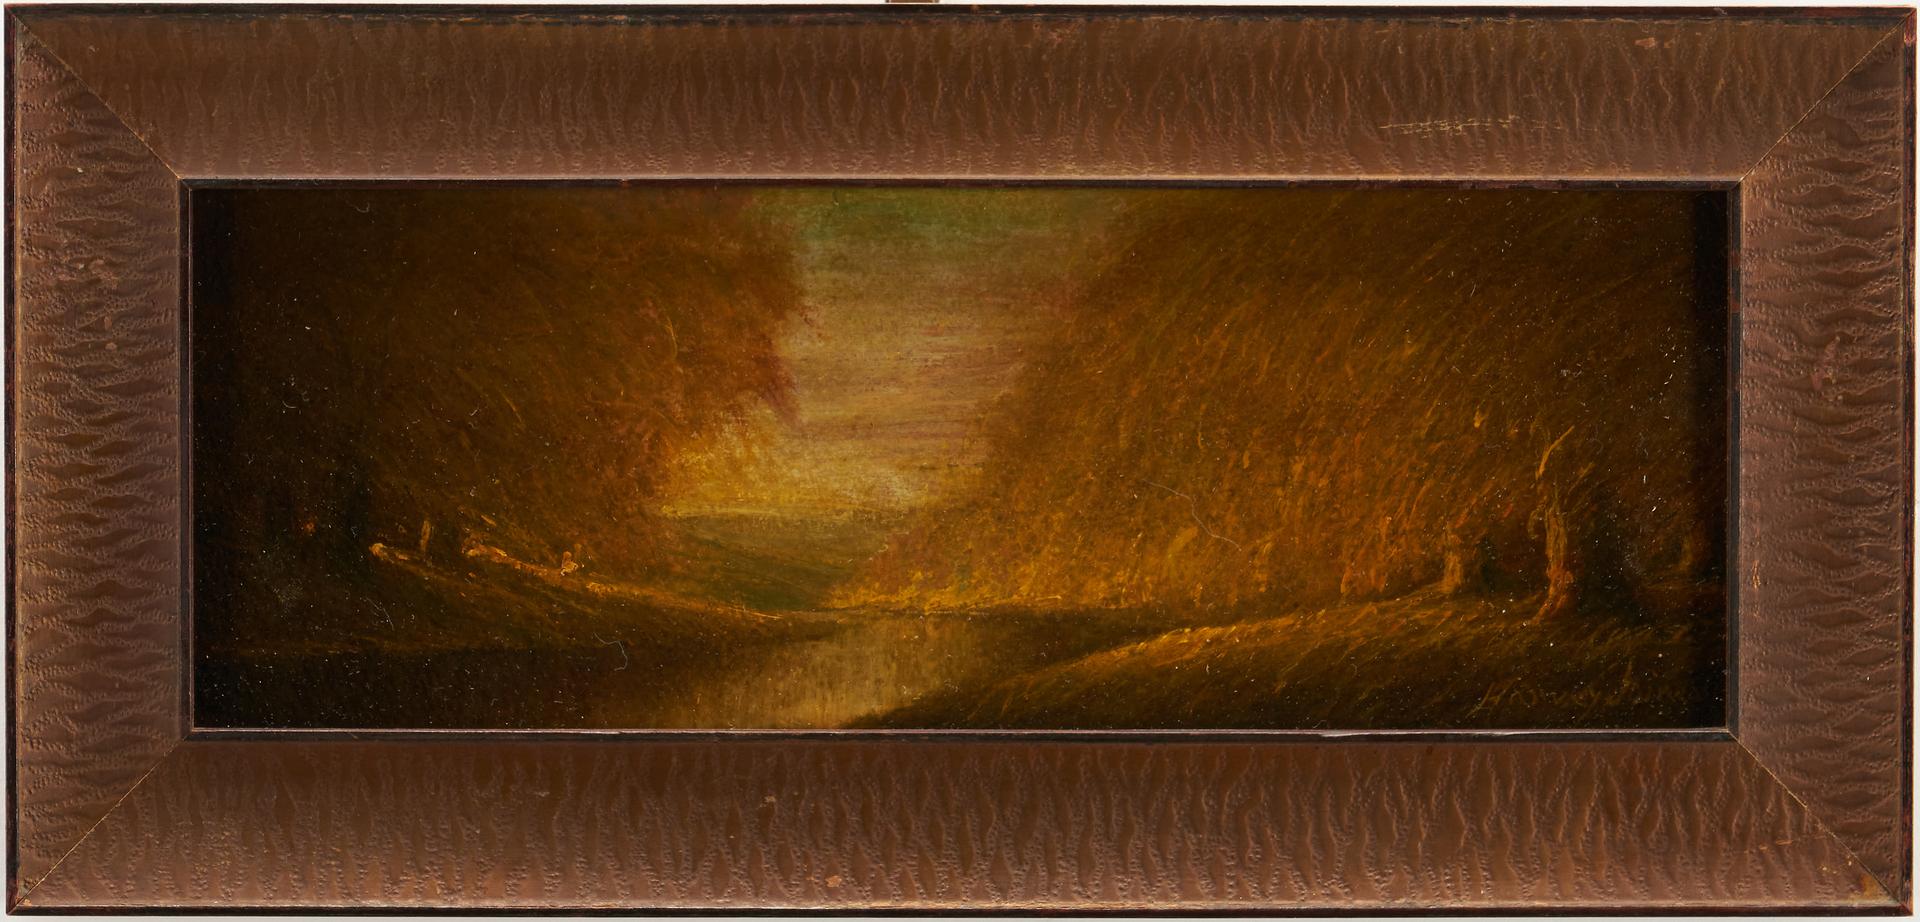 Lot 147: Small Harvey Joiner Oil on Board Fall Landscape